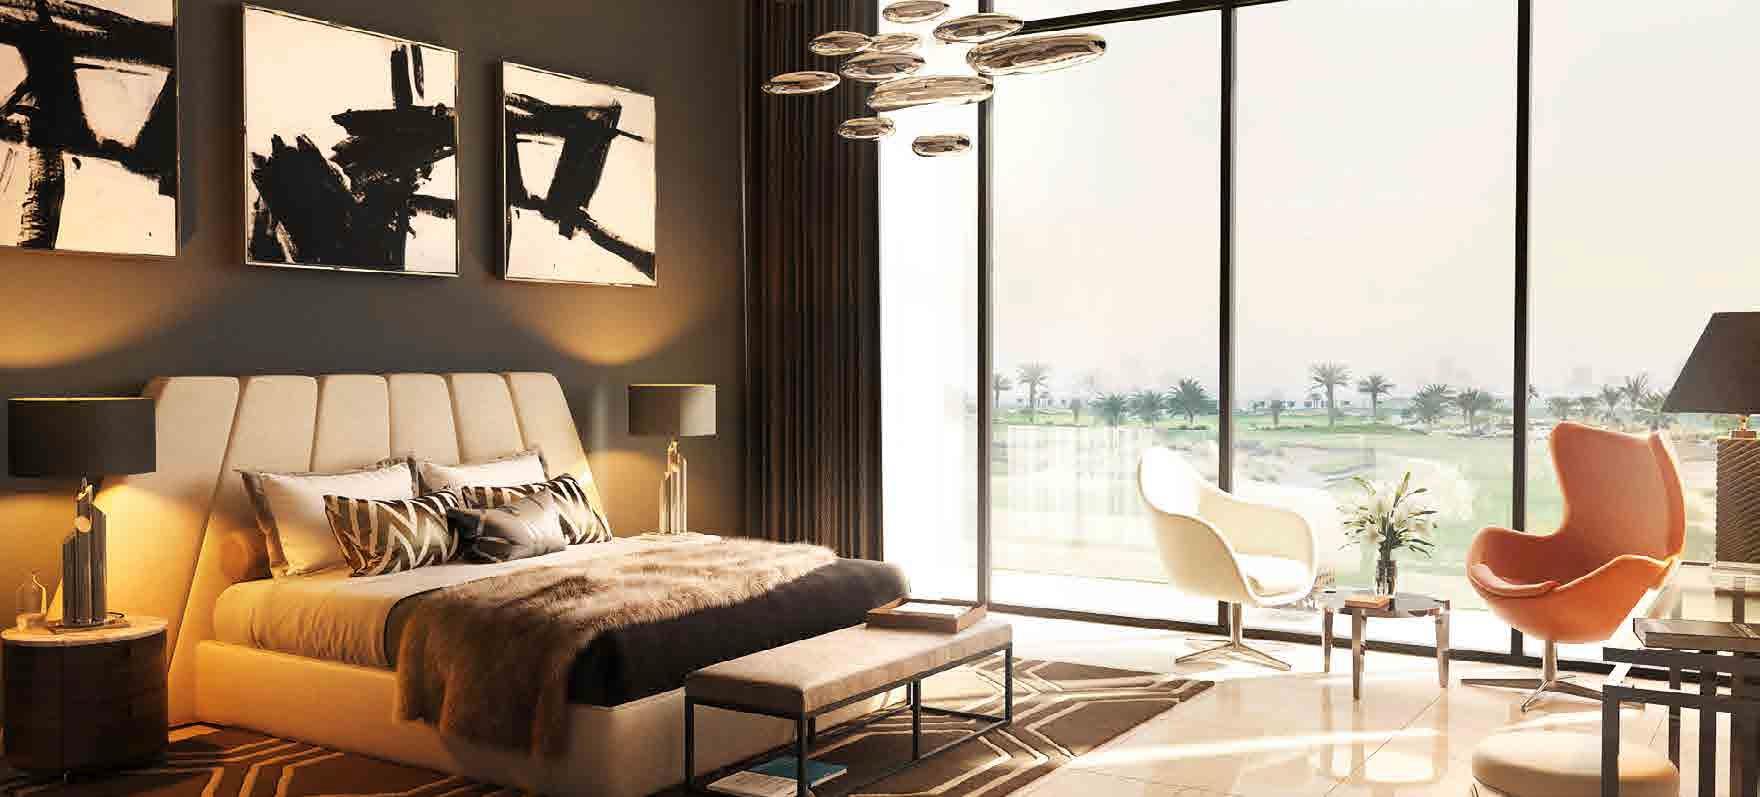 beverly hills boutique villas project apartment interiors1